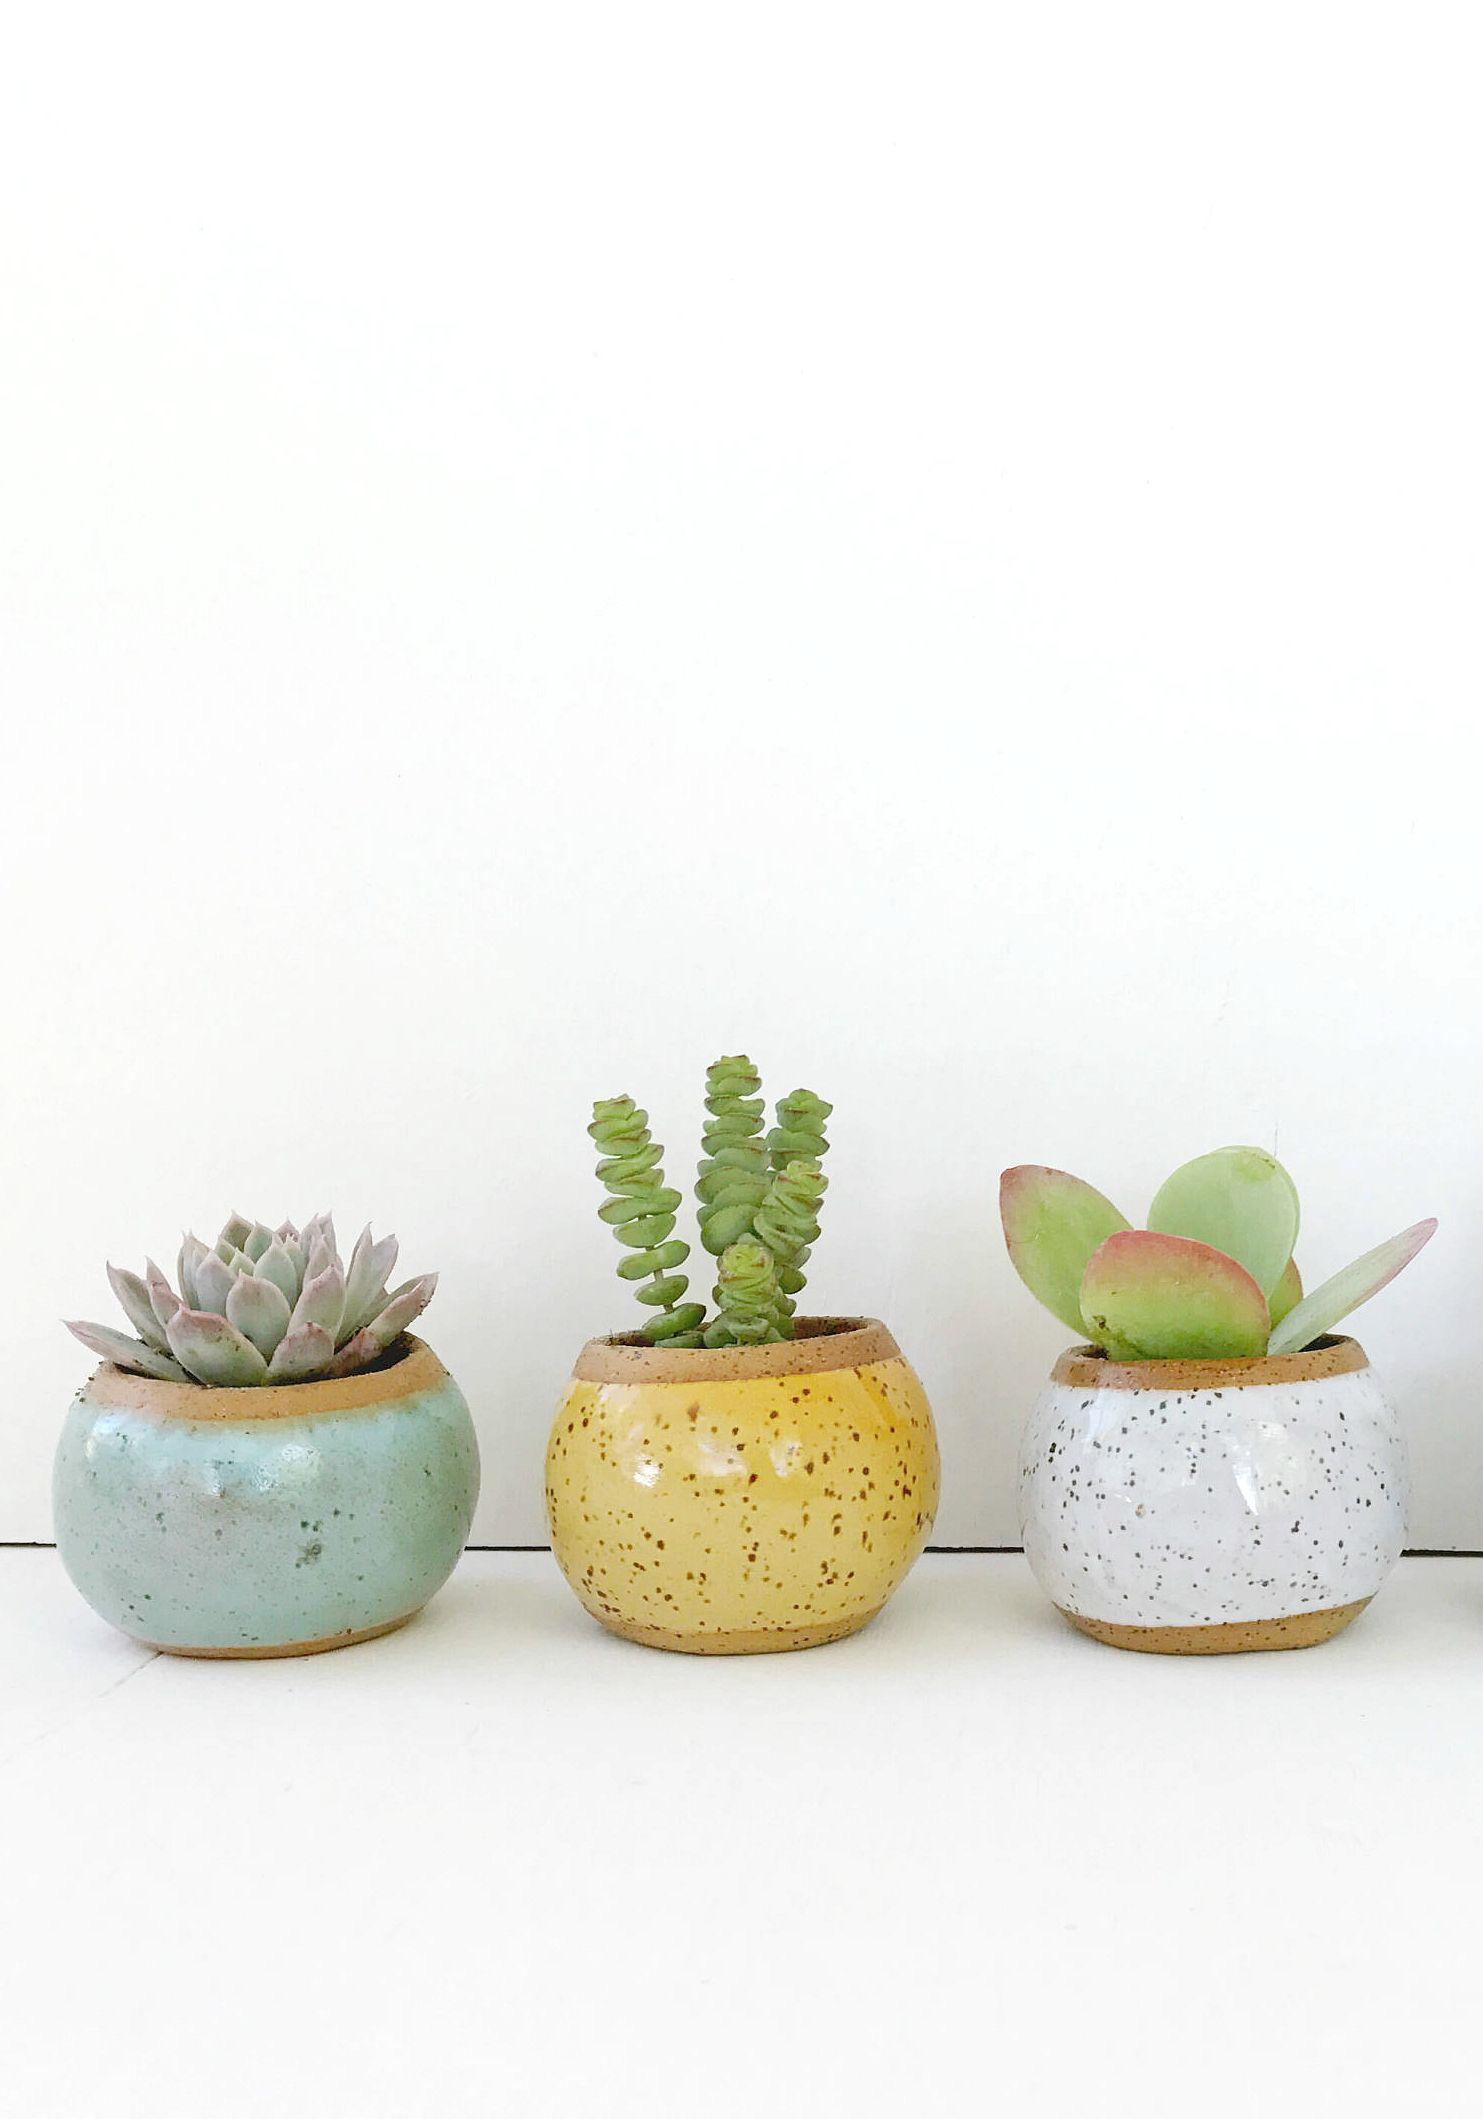 Handmade ceramic planters kristen saksa juen on etsy